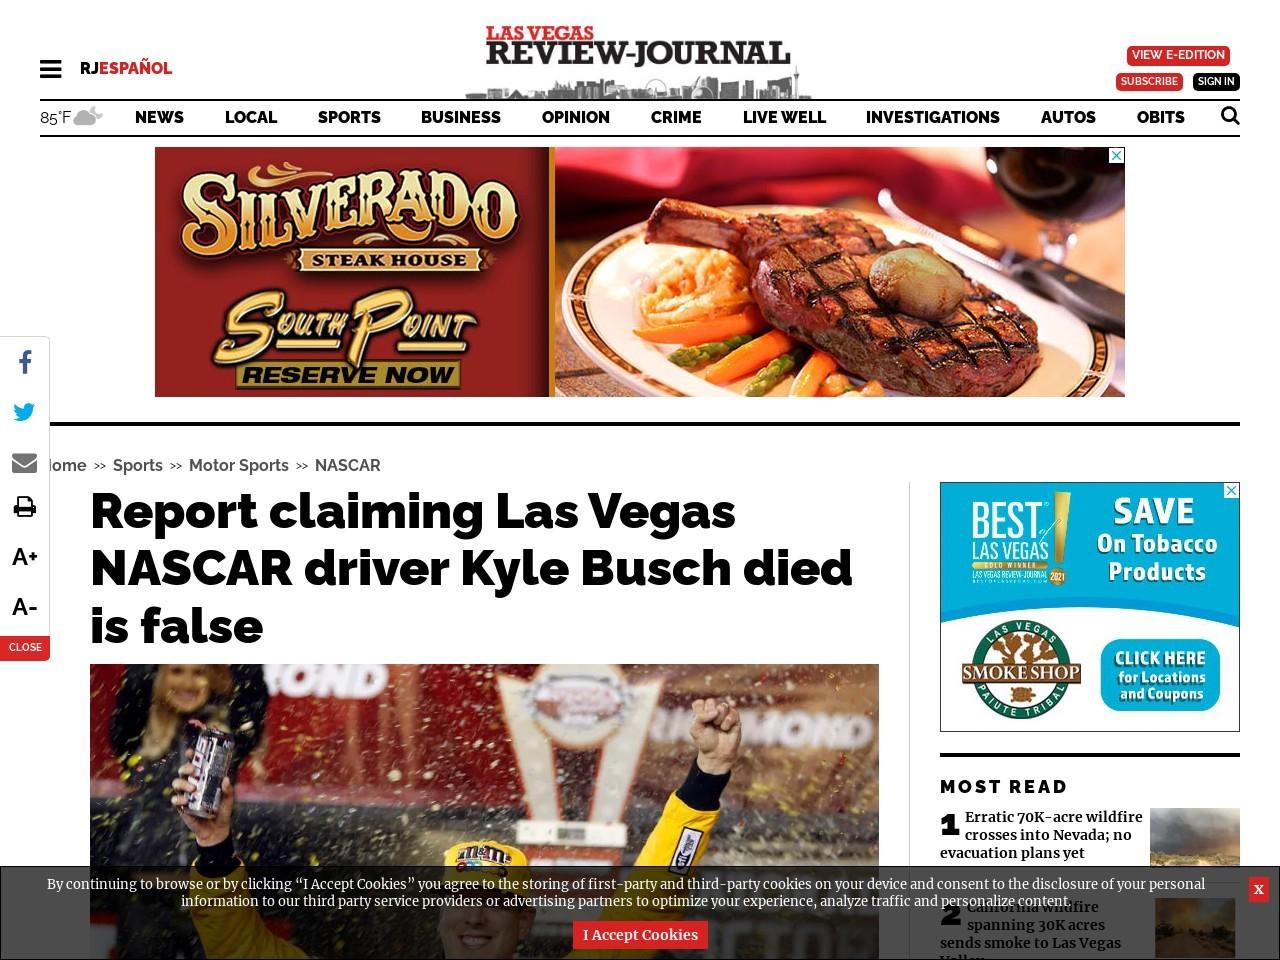 Report claiming Las Vegas NASCAR driver Kyle Busch died is false